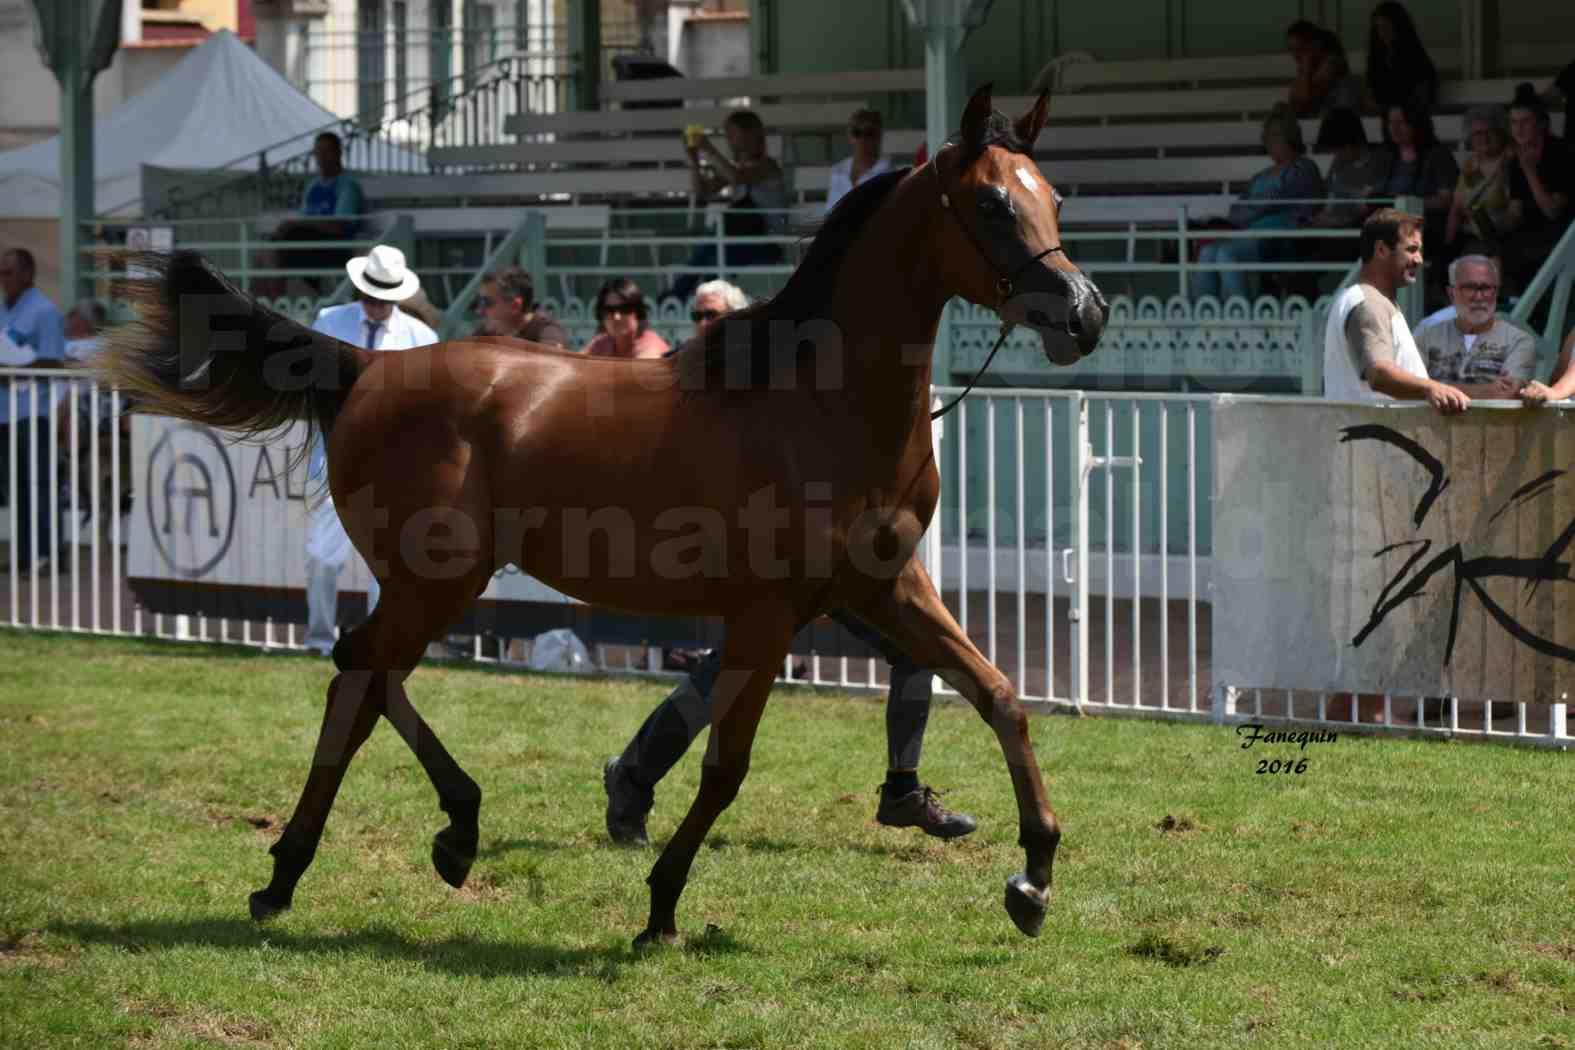 International Arabian Horse Show B de VICHY 2016 - ASRAR MS - Notre Sélection - 3